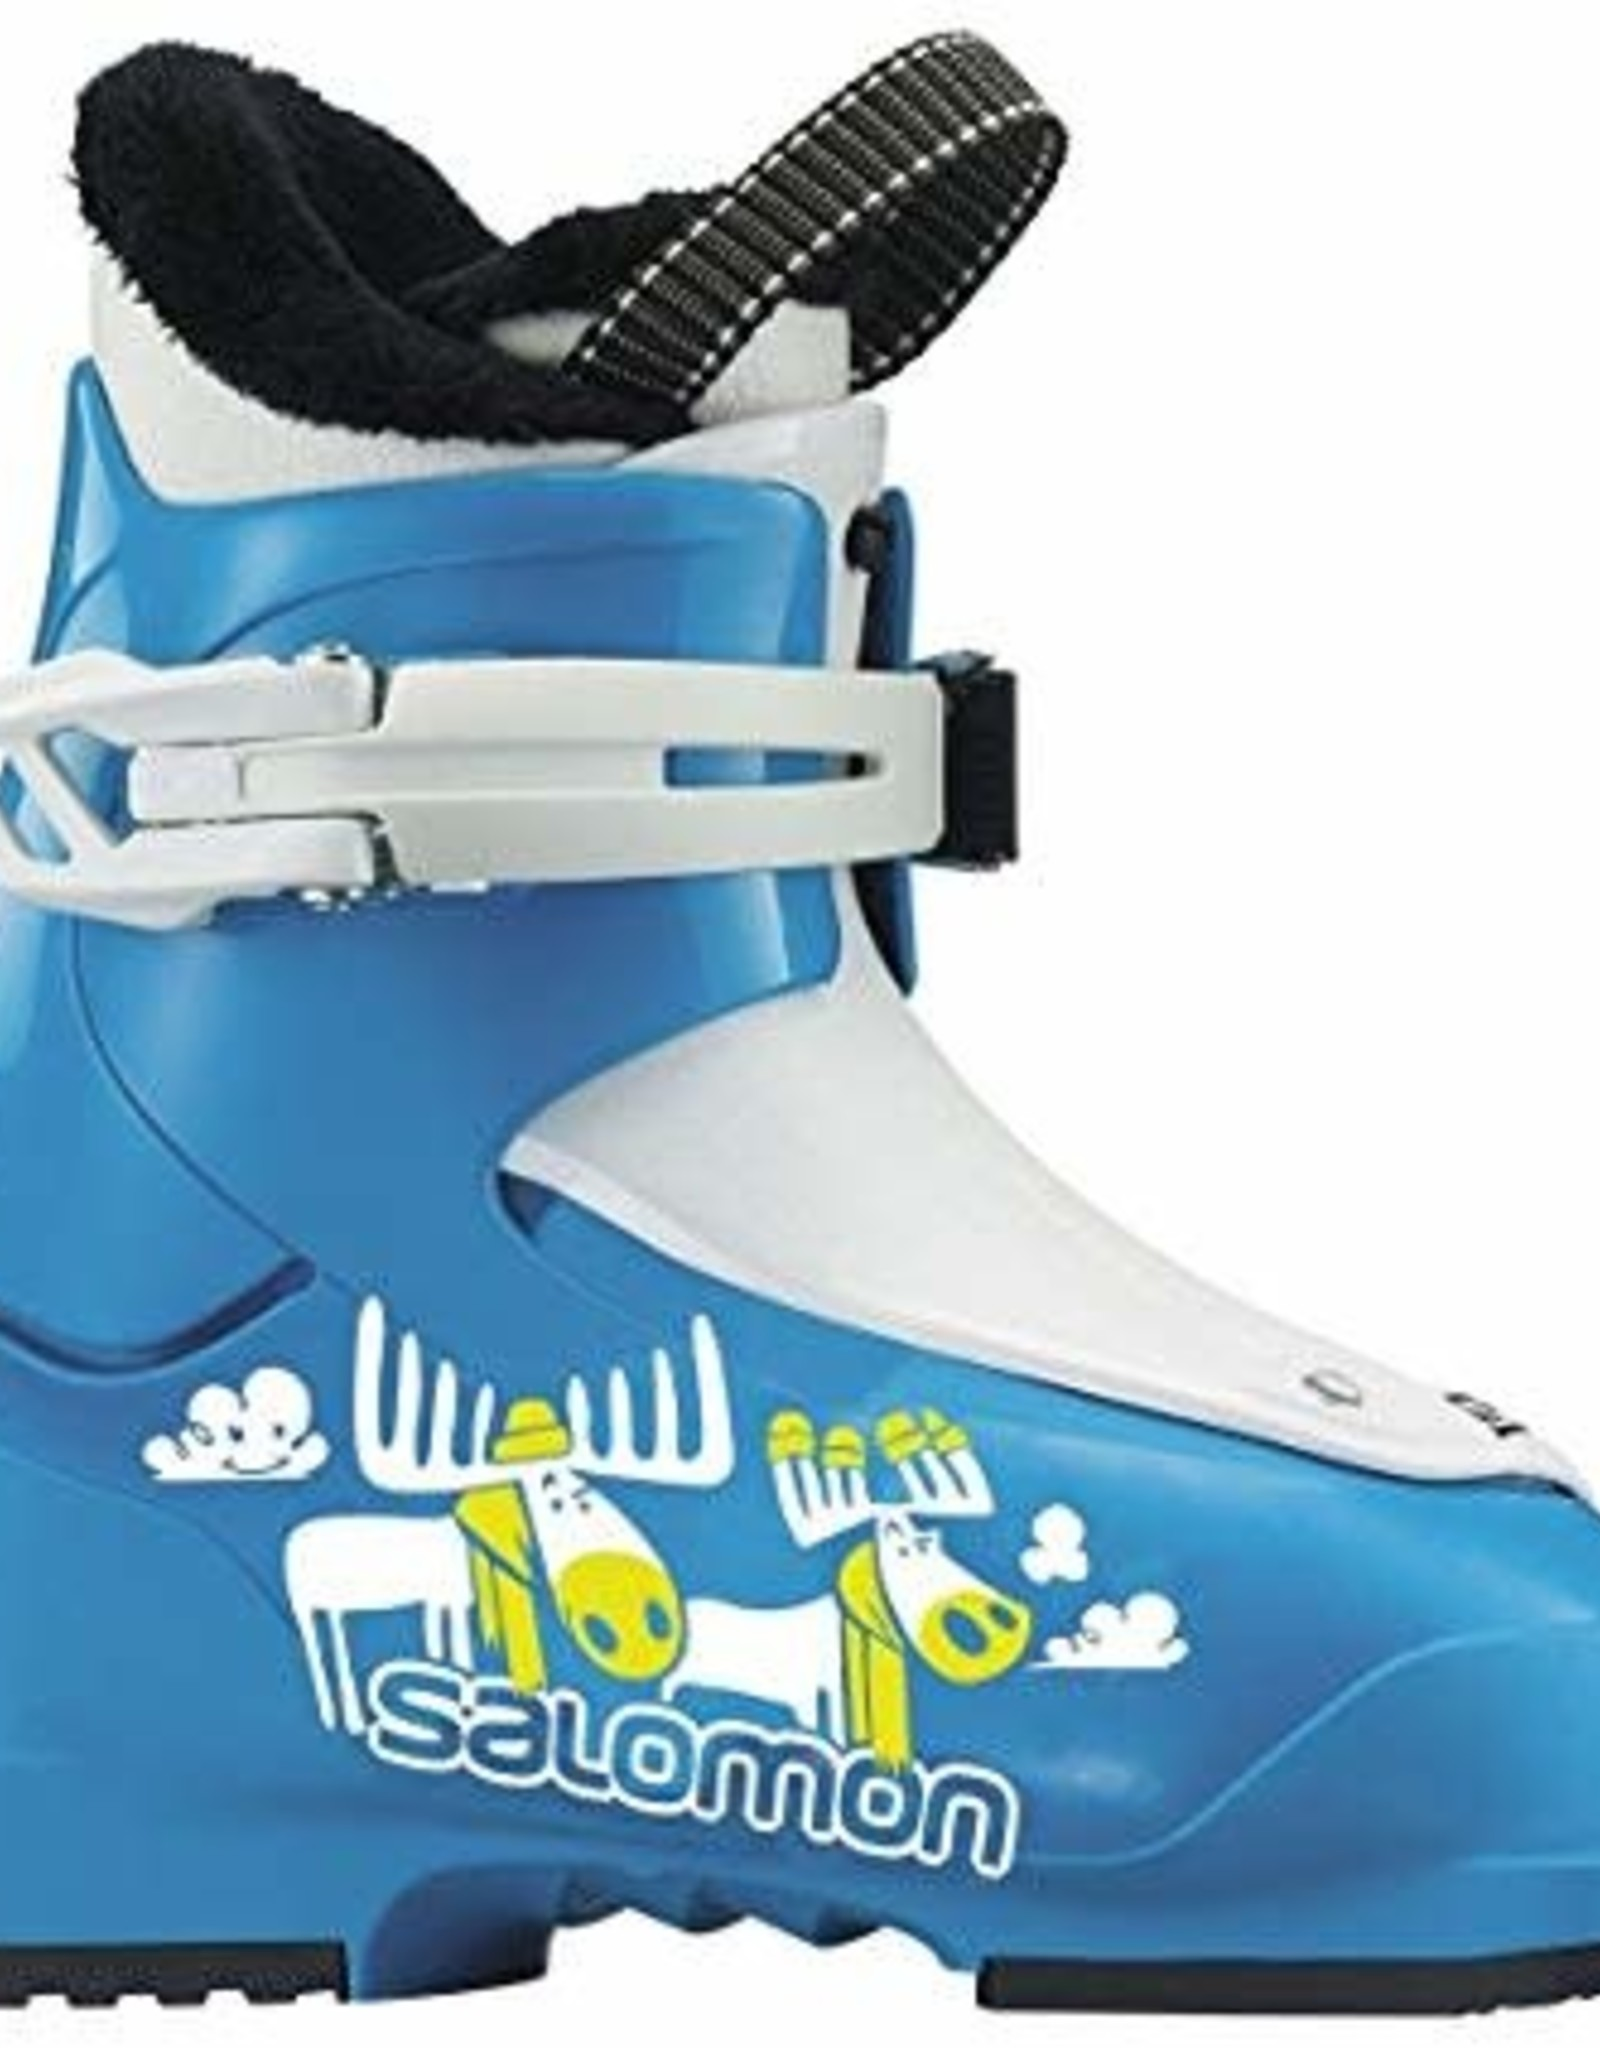 SALOMON Salomon T1 Blue/White 17